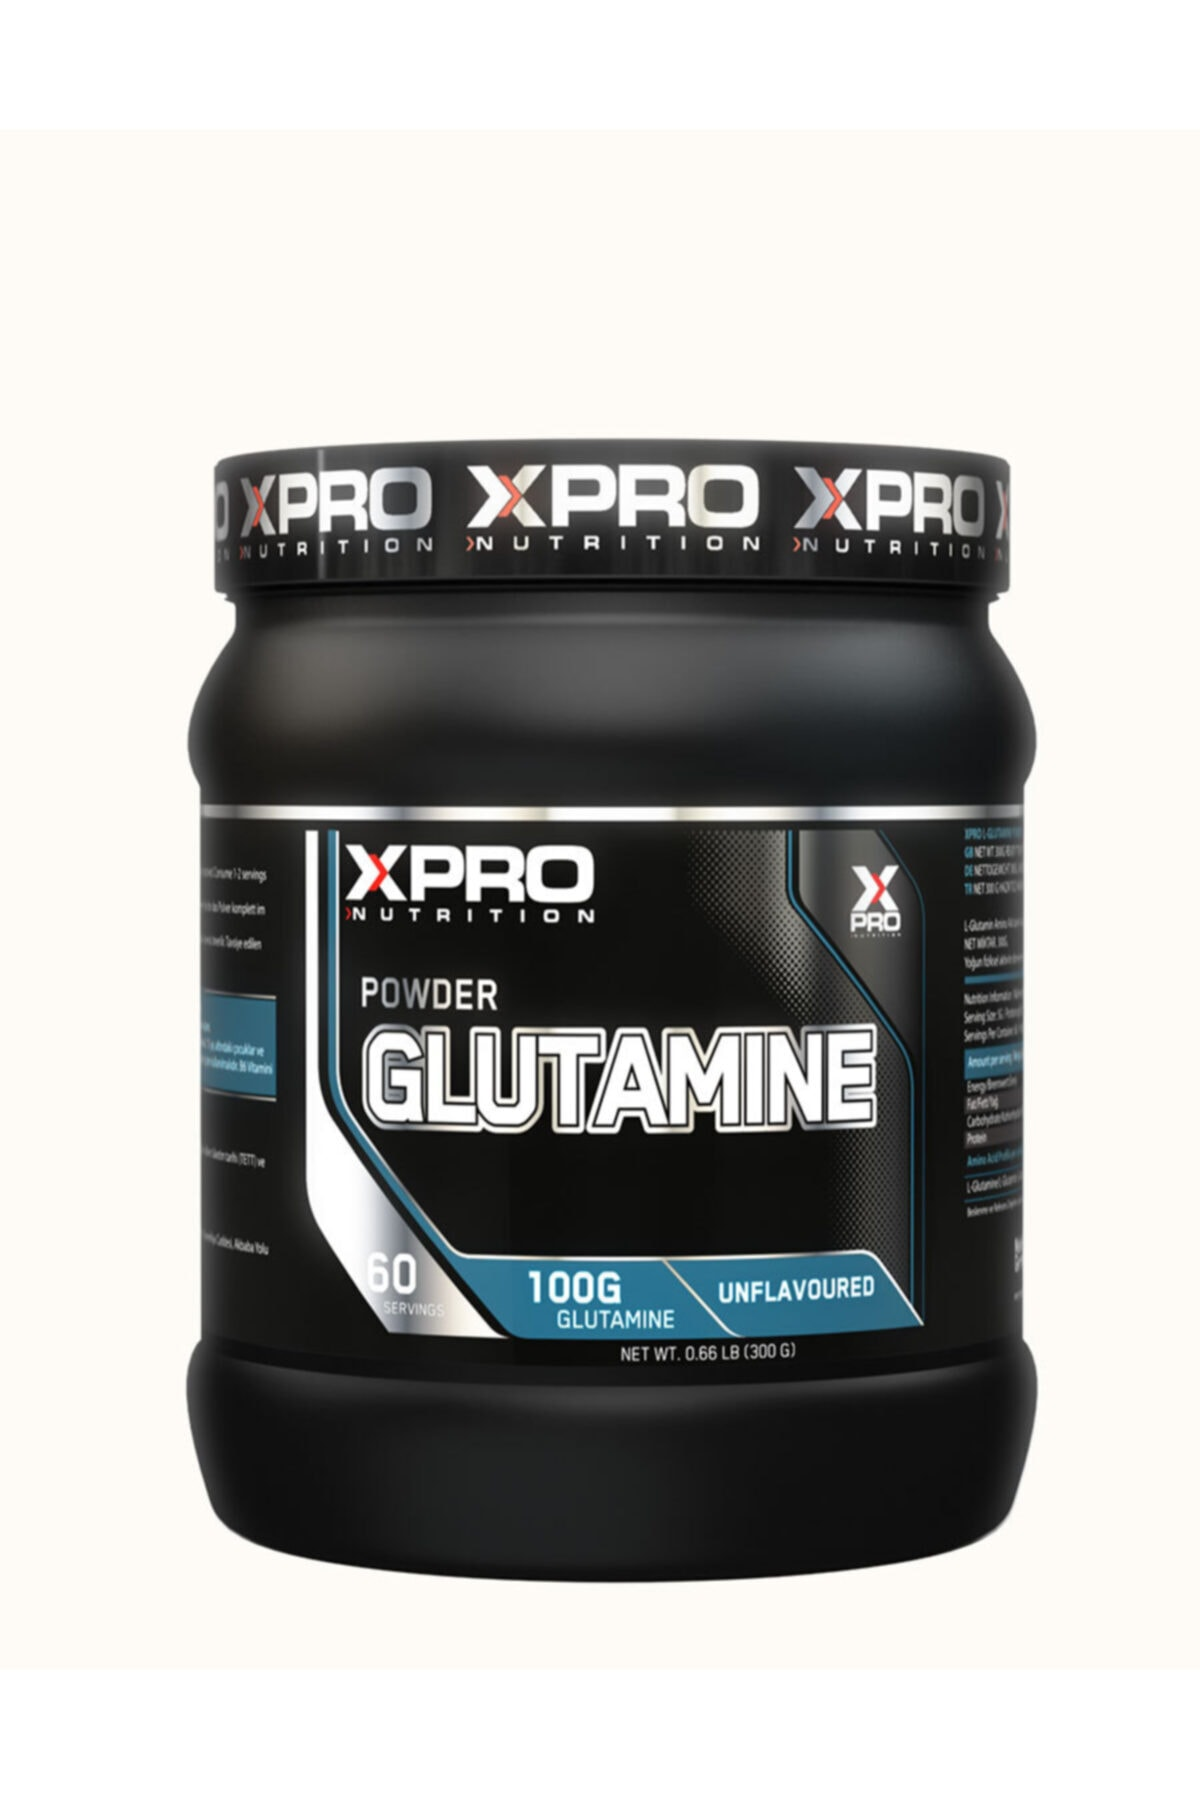 Xpro Nutrition Glutamine Powder 300gr 1